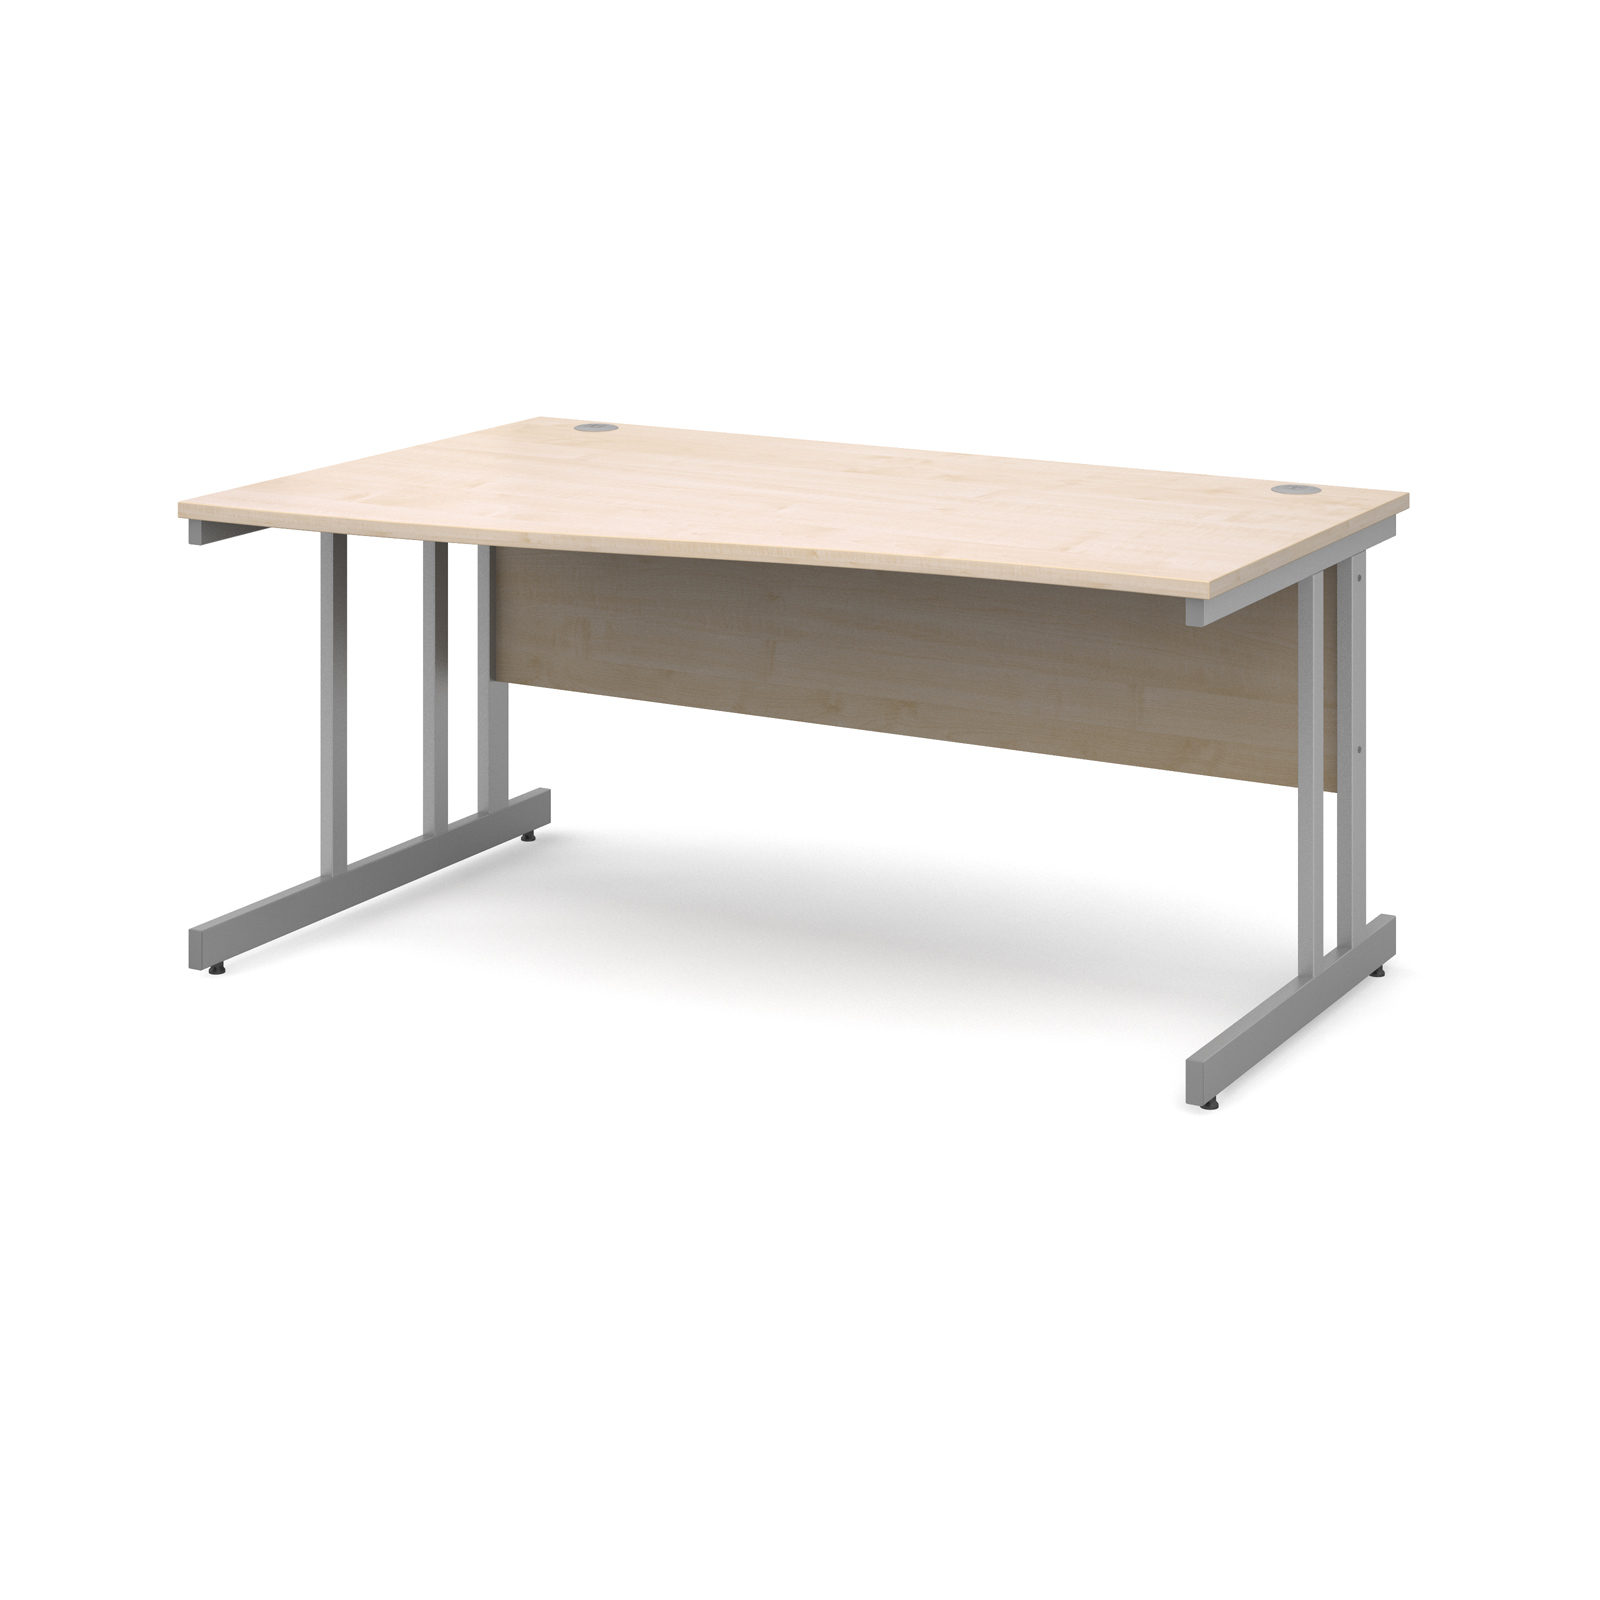 Momento left hand wave desk 1600mm - silver cantilever frame, maple top